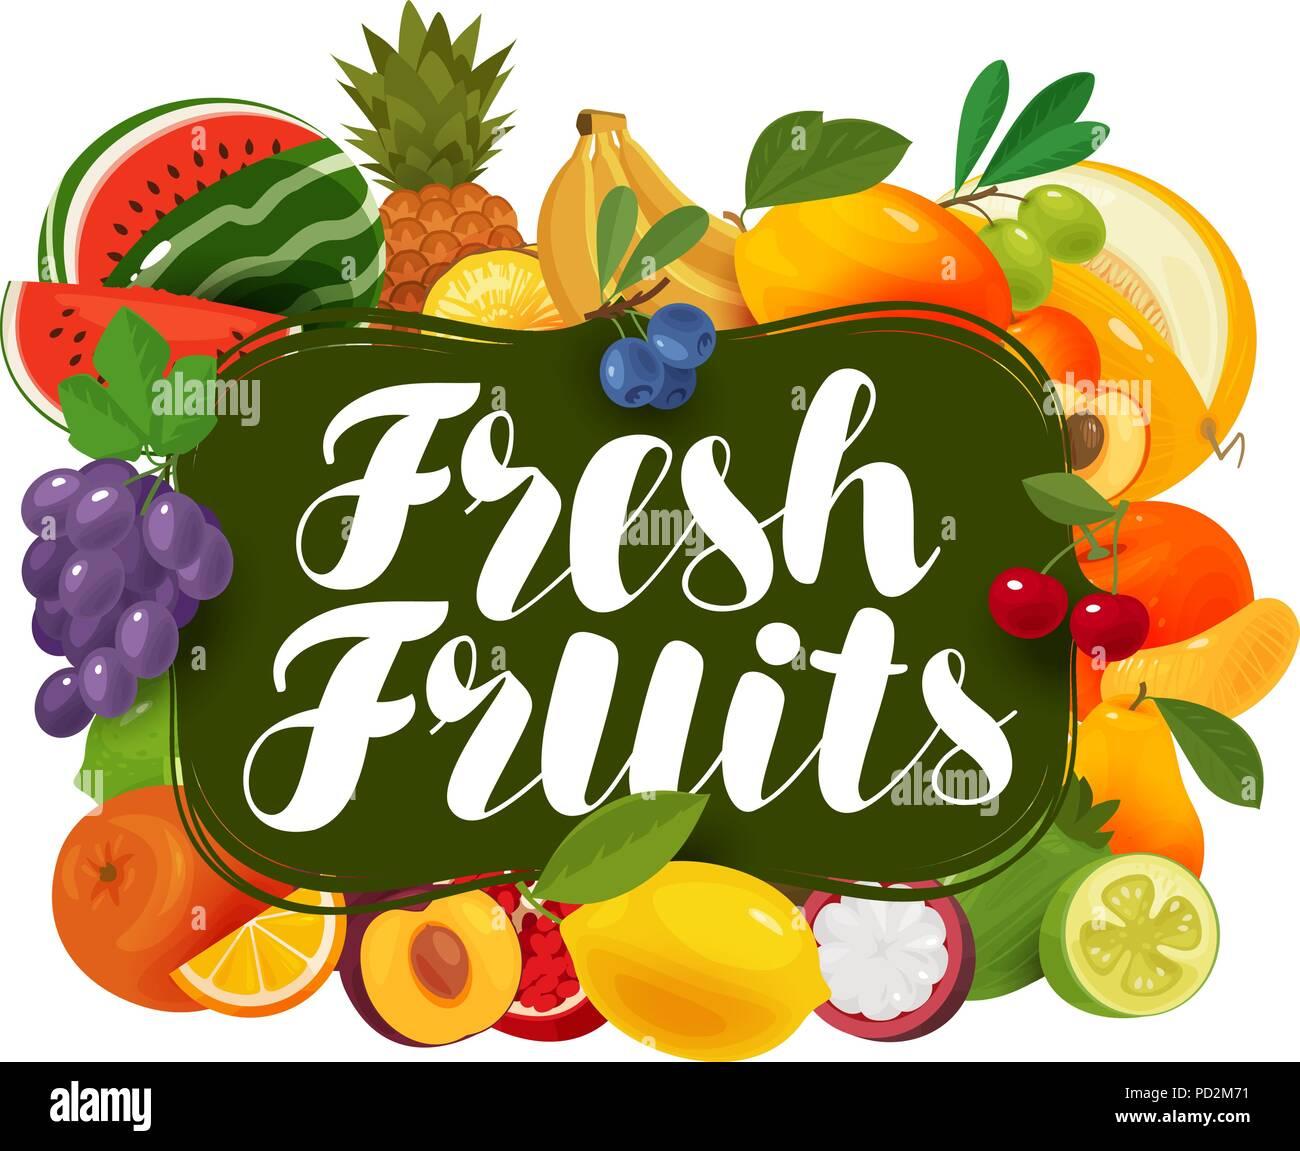 Fresh fruits. Natural food, greengrocery concept. Vector illustration - Stock Image